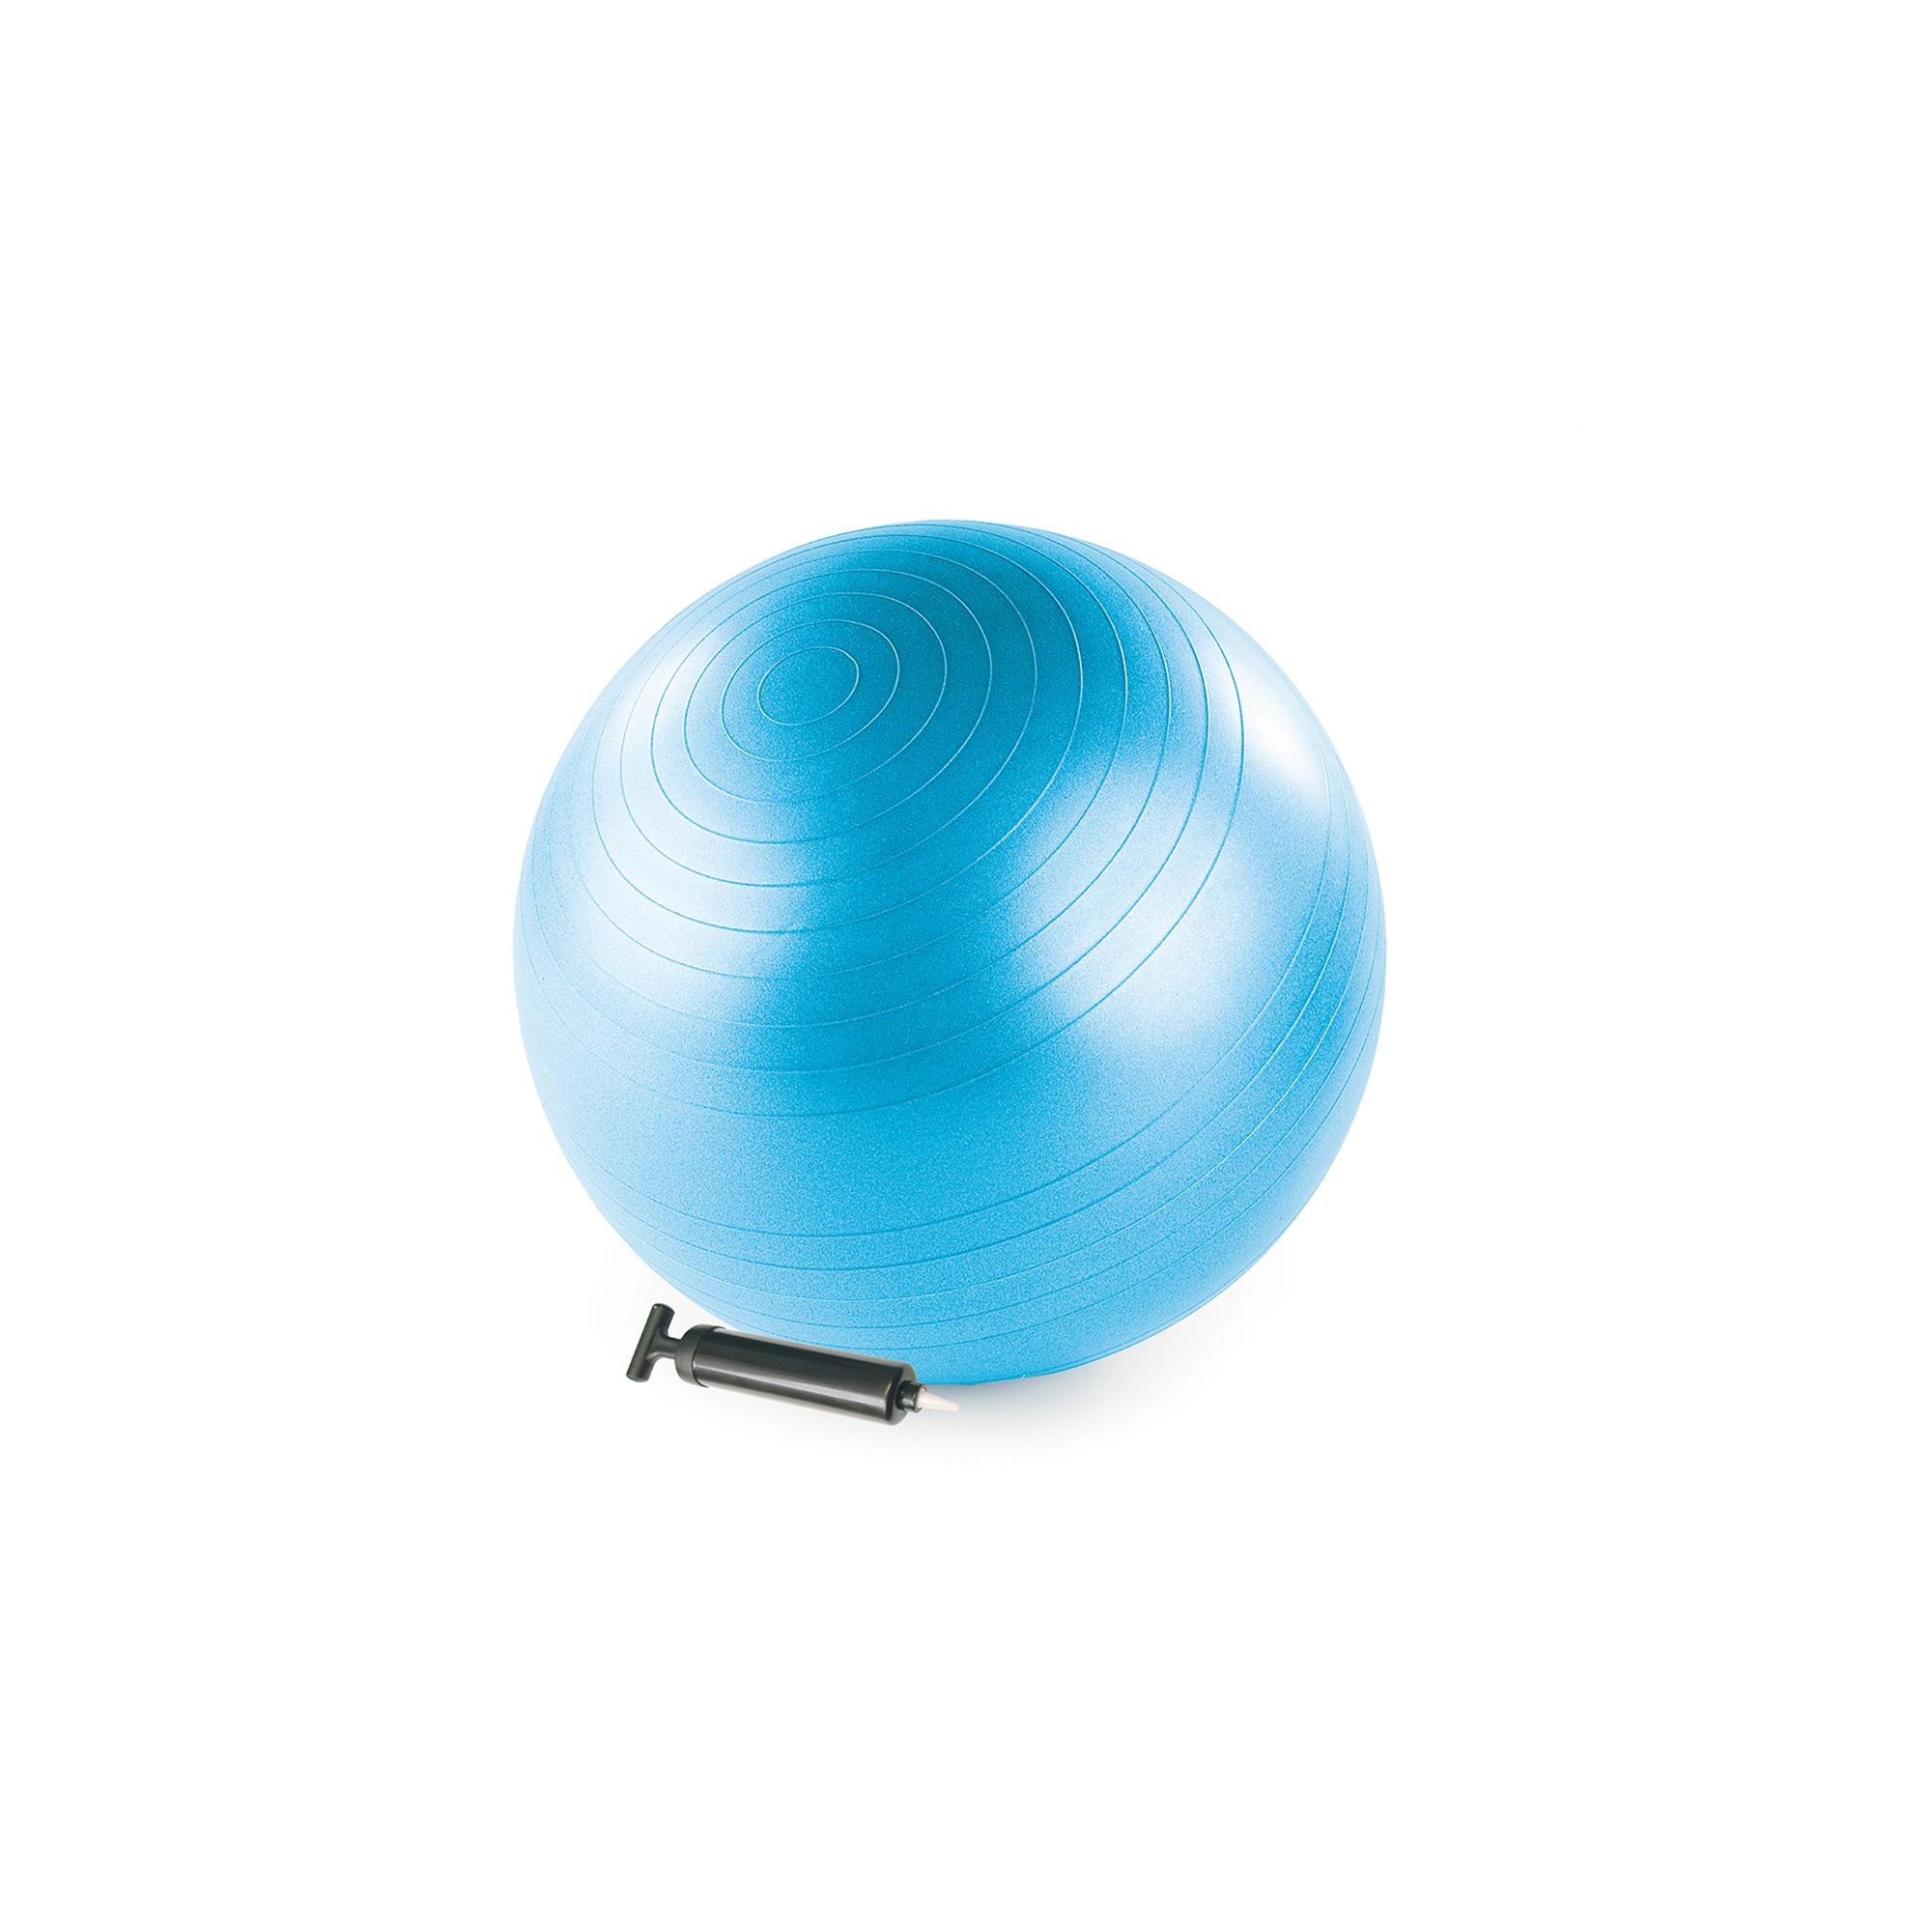 Stott 174 Pilates Stability Balls Shop All Studio